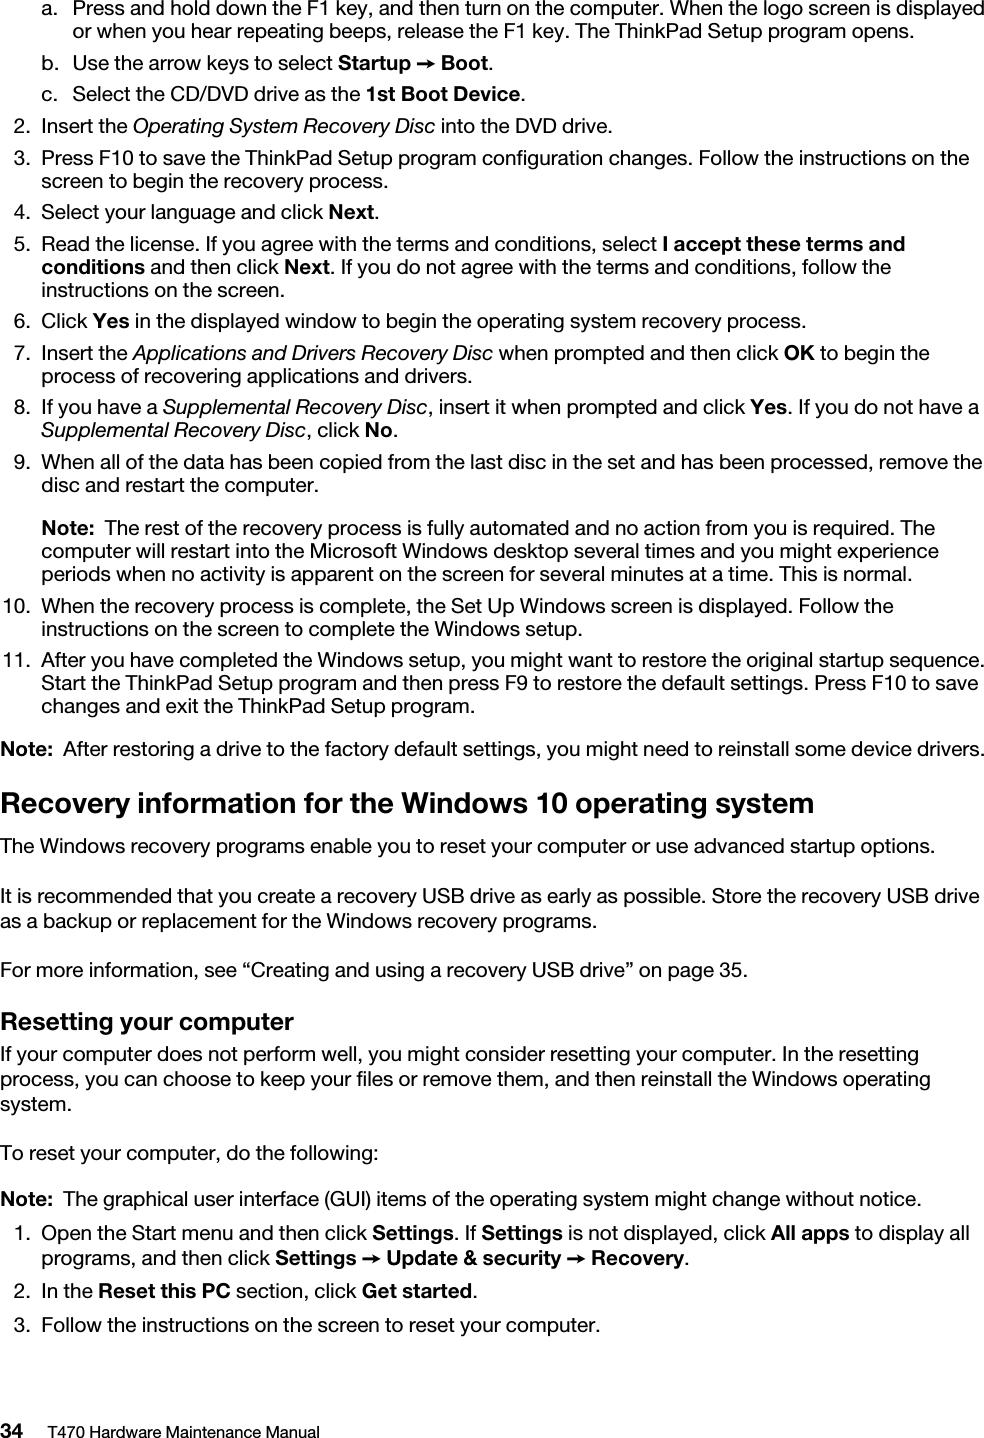 Lenovo T470 Hmm En Sp40M11890 03 Hardware Maintenance Manual User